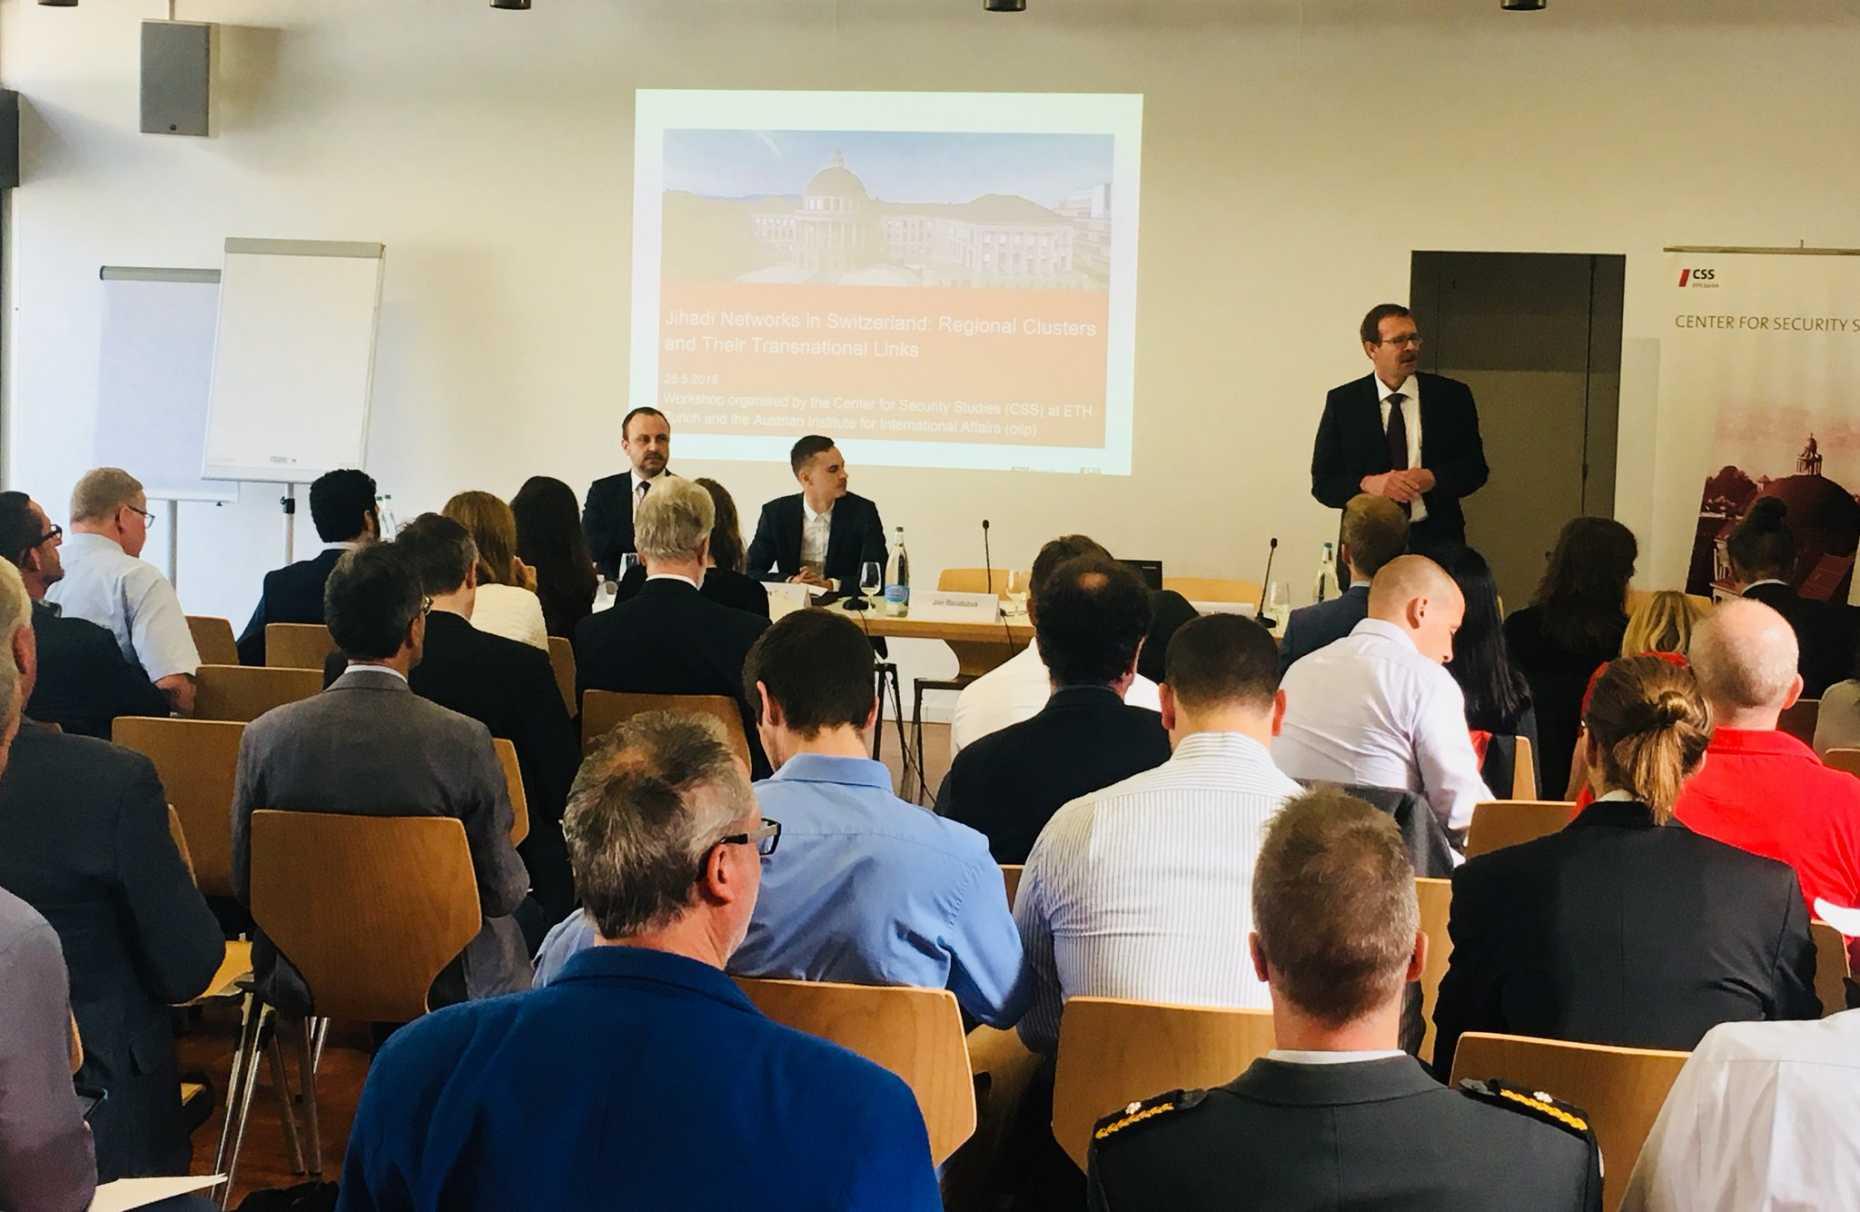 ETH Workshop: Jihadi Networks in Switzerland  Regional Clusters and